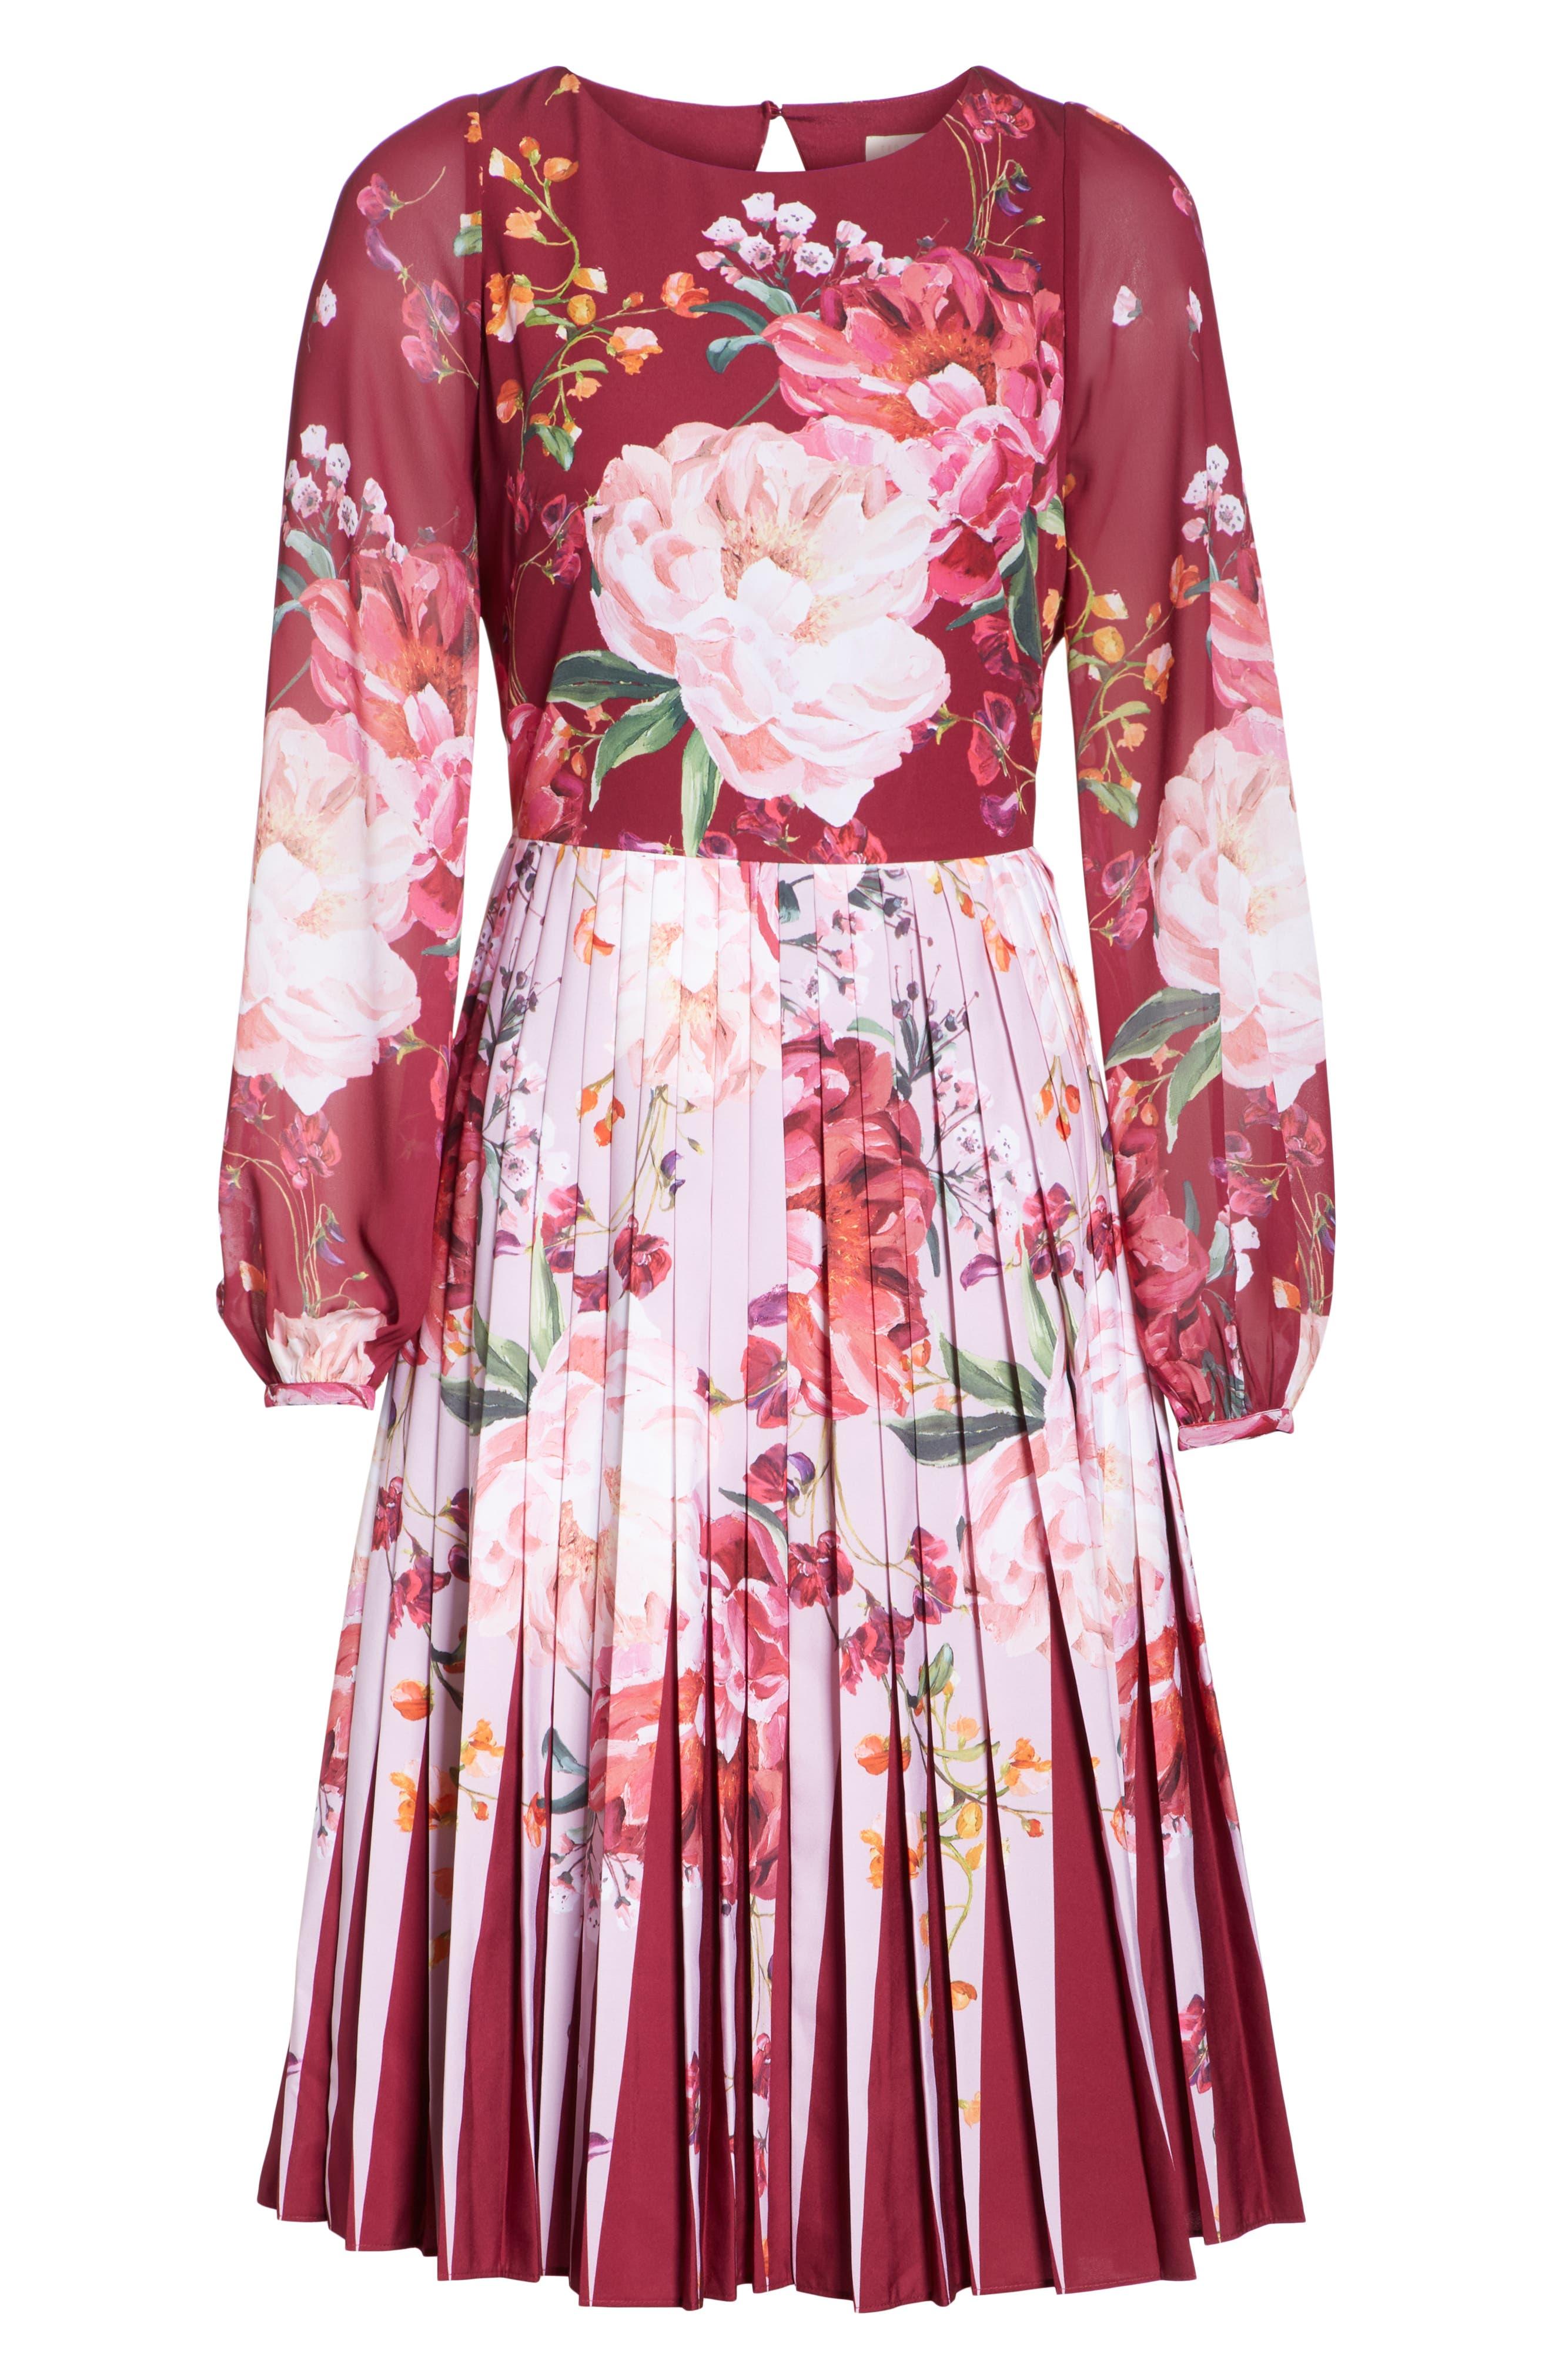 Esperan Serenity Contrast Pleated Skirt Dress,                             Alternate thumbnail 6, color,                             Maroon